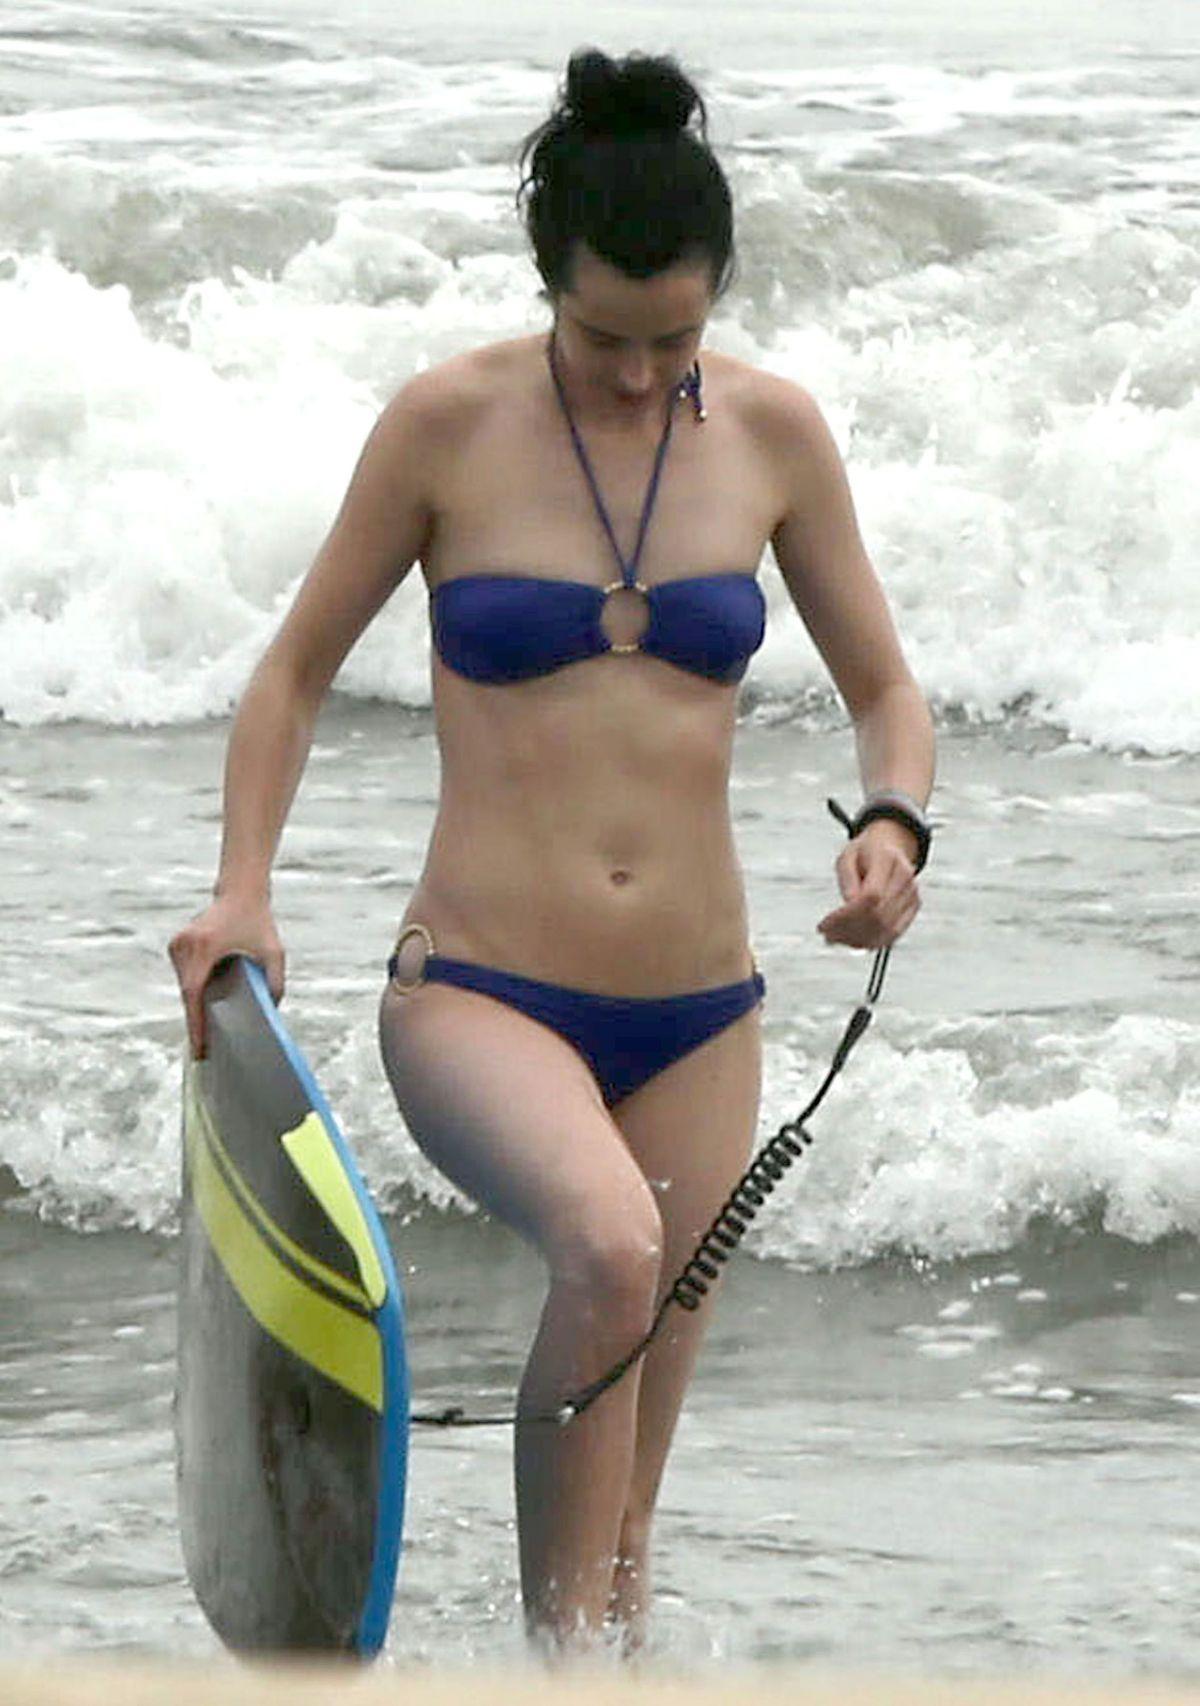 Bikini Kristen Ritter nudes (17 photos), Pussy, Sideboobs, Boobs, lingerie 2019